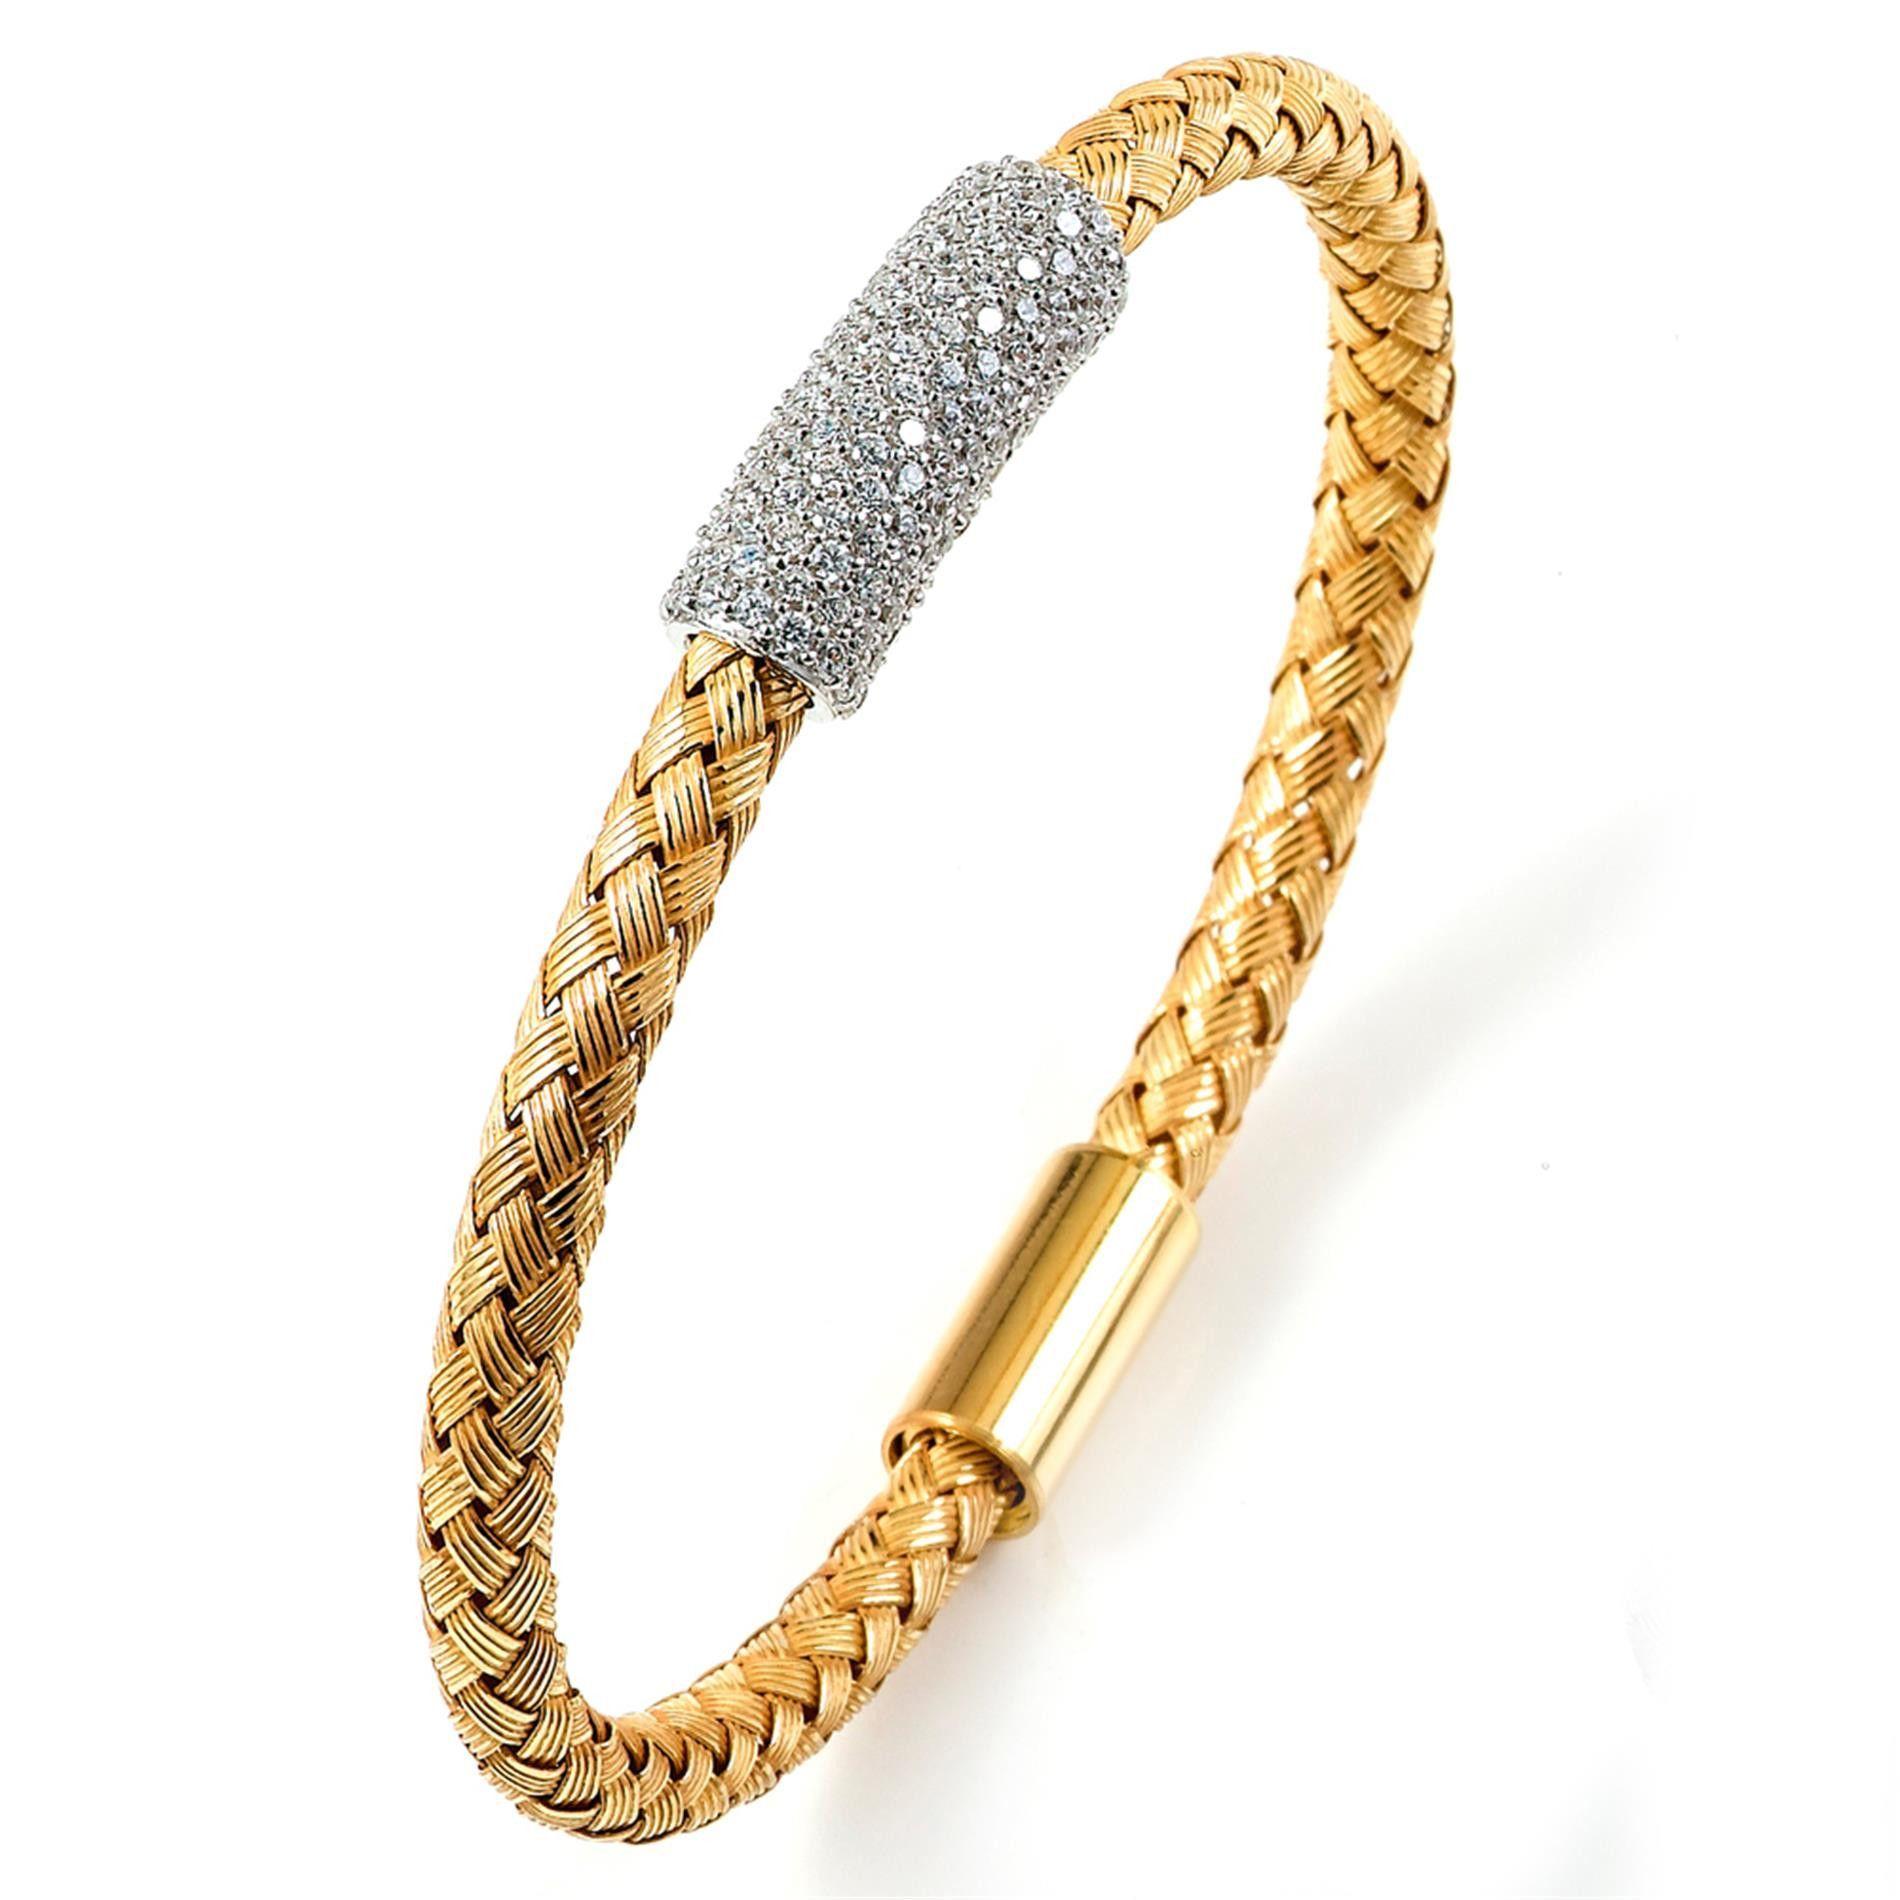 Buy sterling silver bangle bracelet yellow gold set cubic zirconia